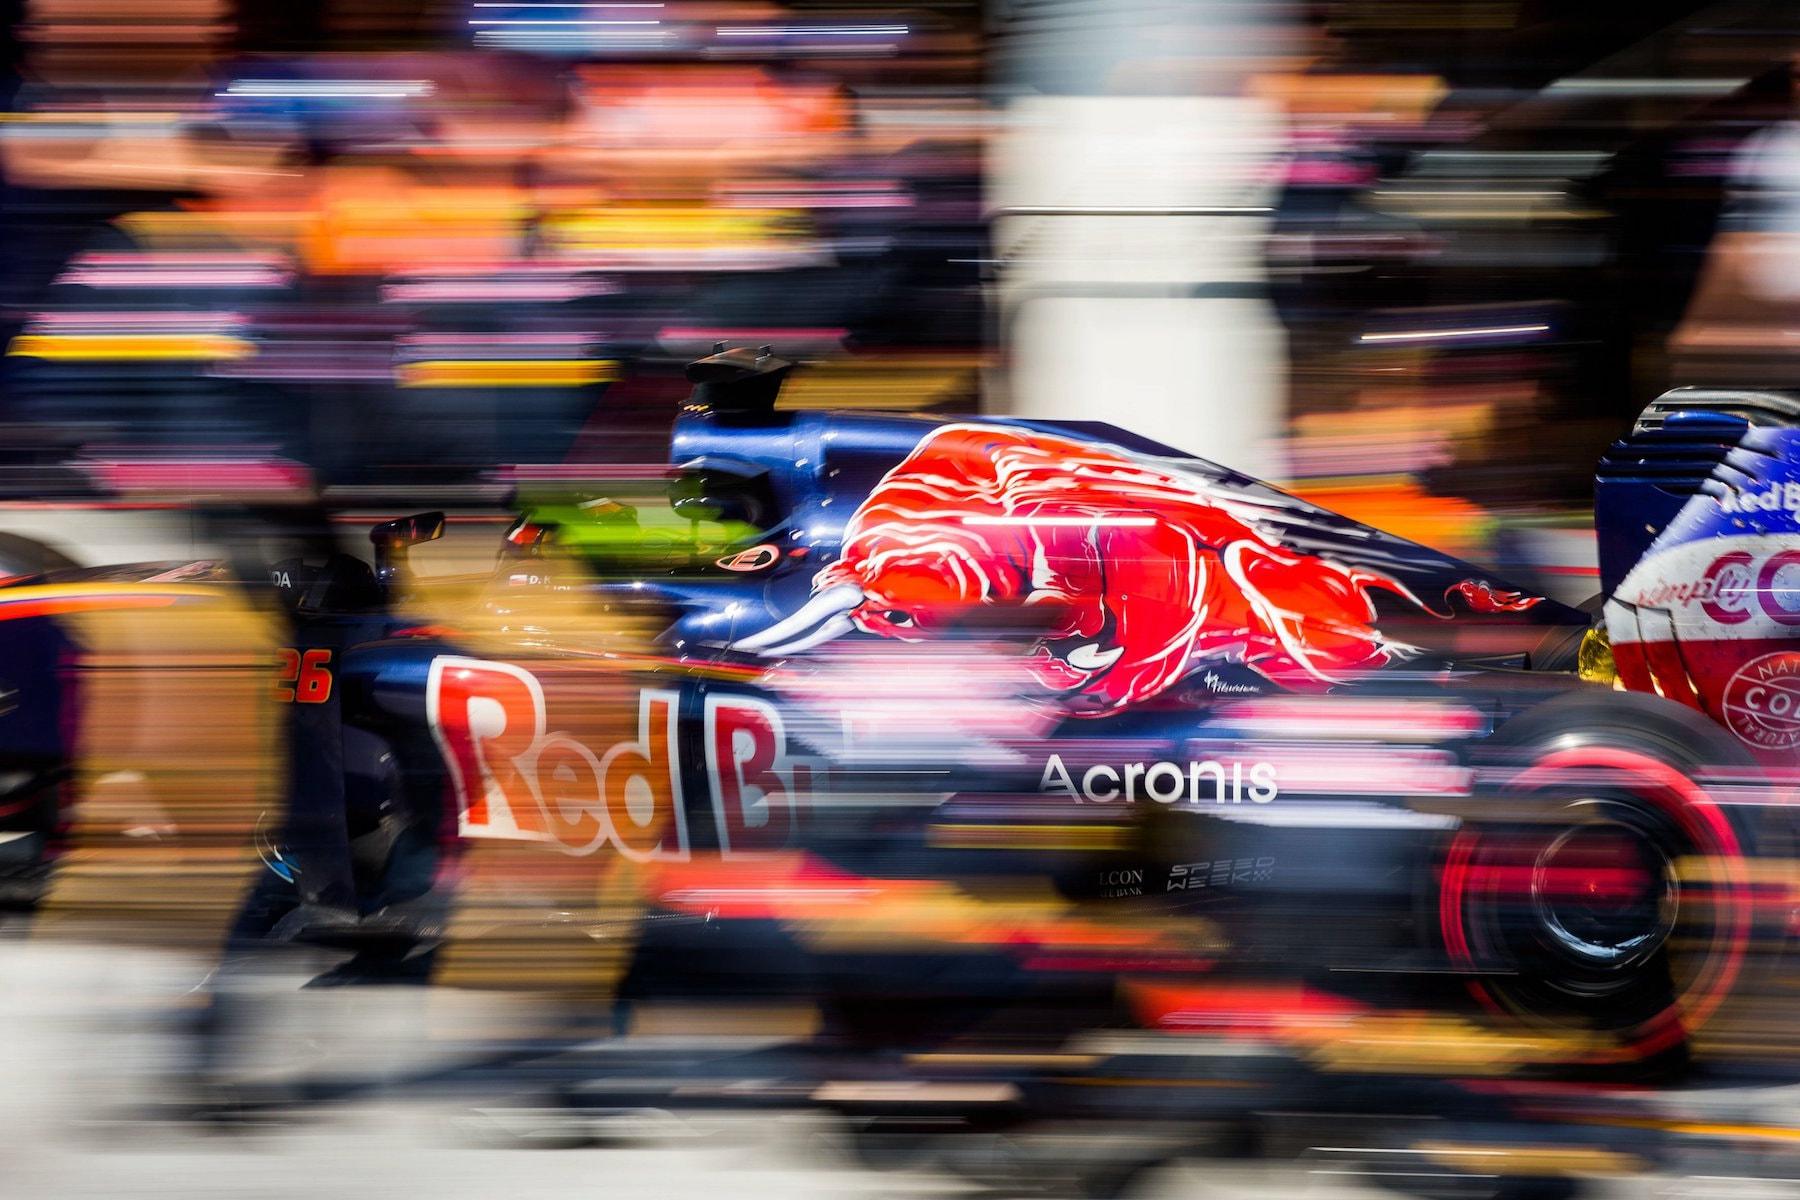 Salracing | Daniil Kvyat | Scuderia Toro Rosso